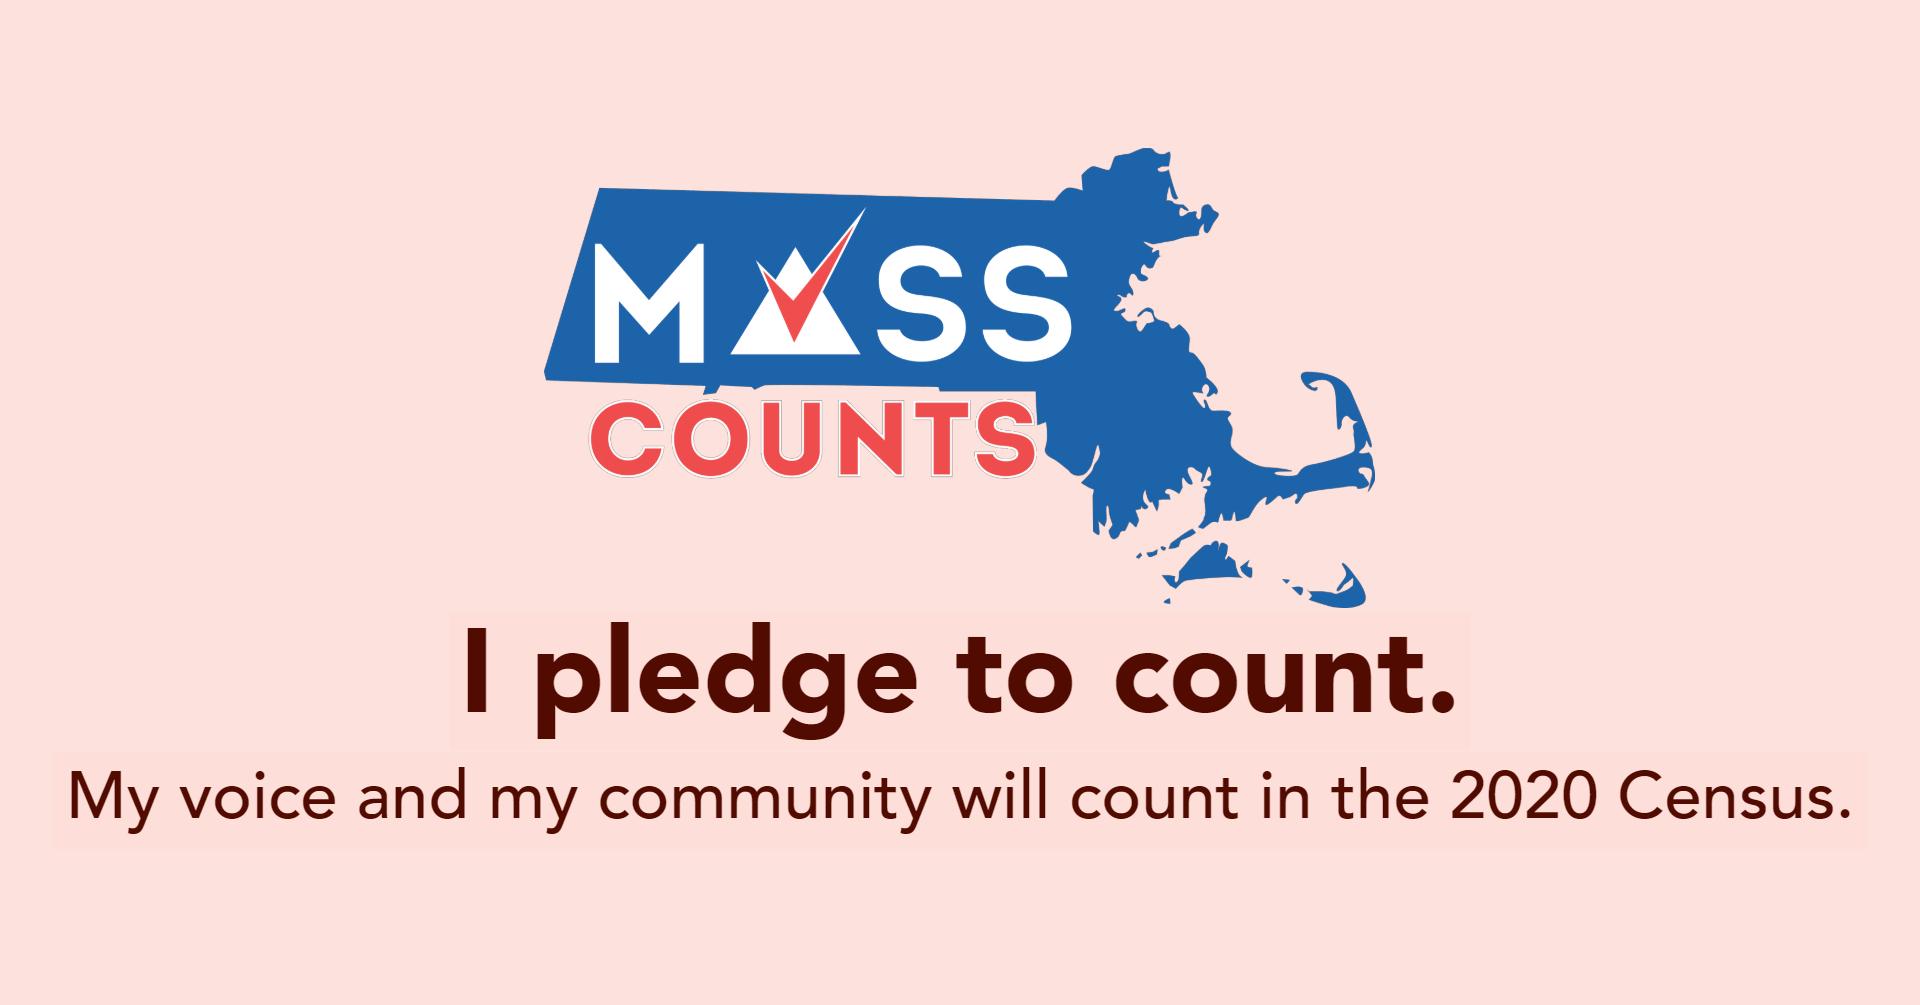 mass counts